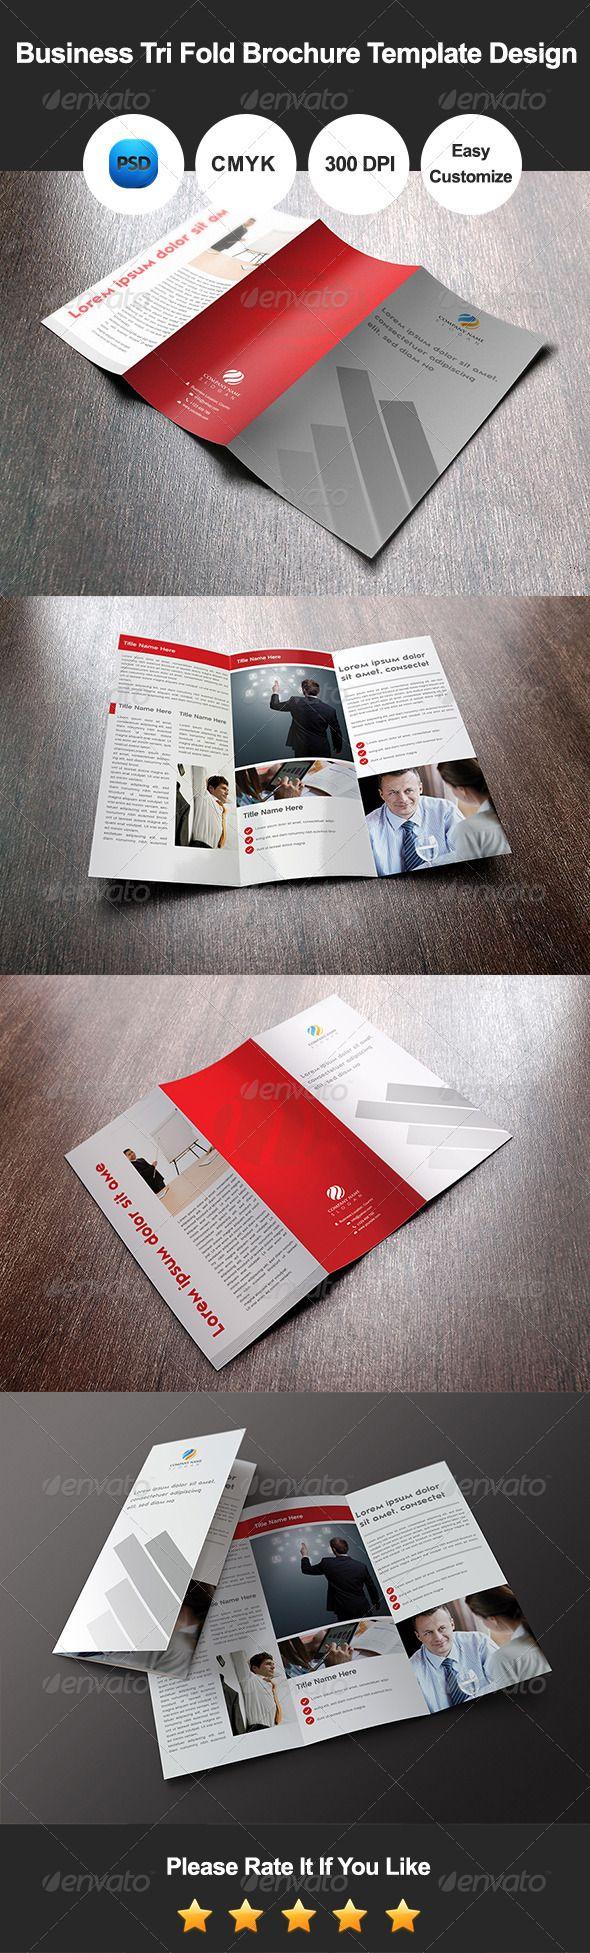 Business Tri Fold Brochure Template Design  —  PSD Template